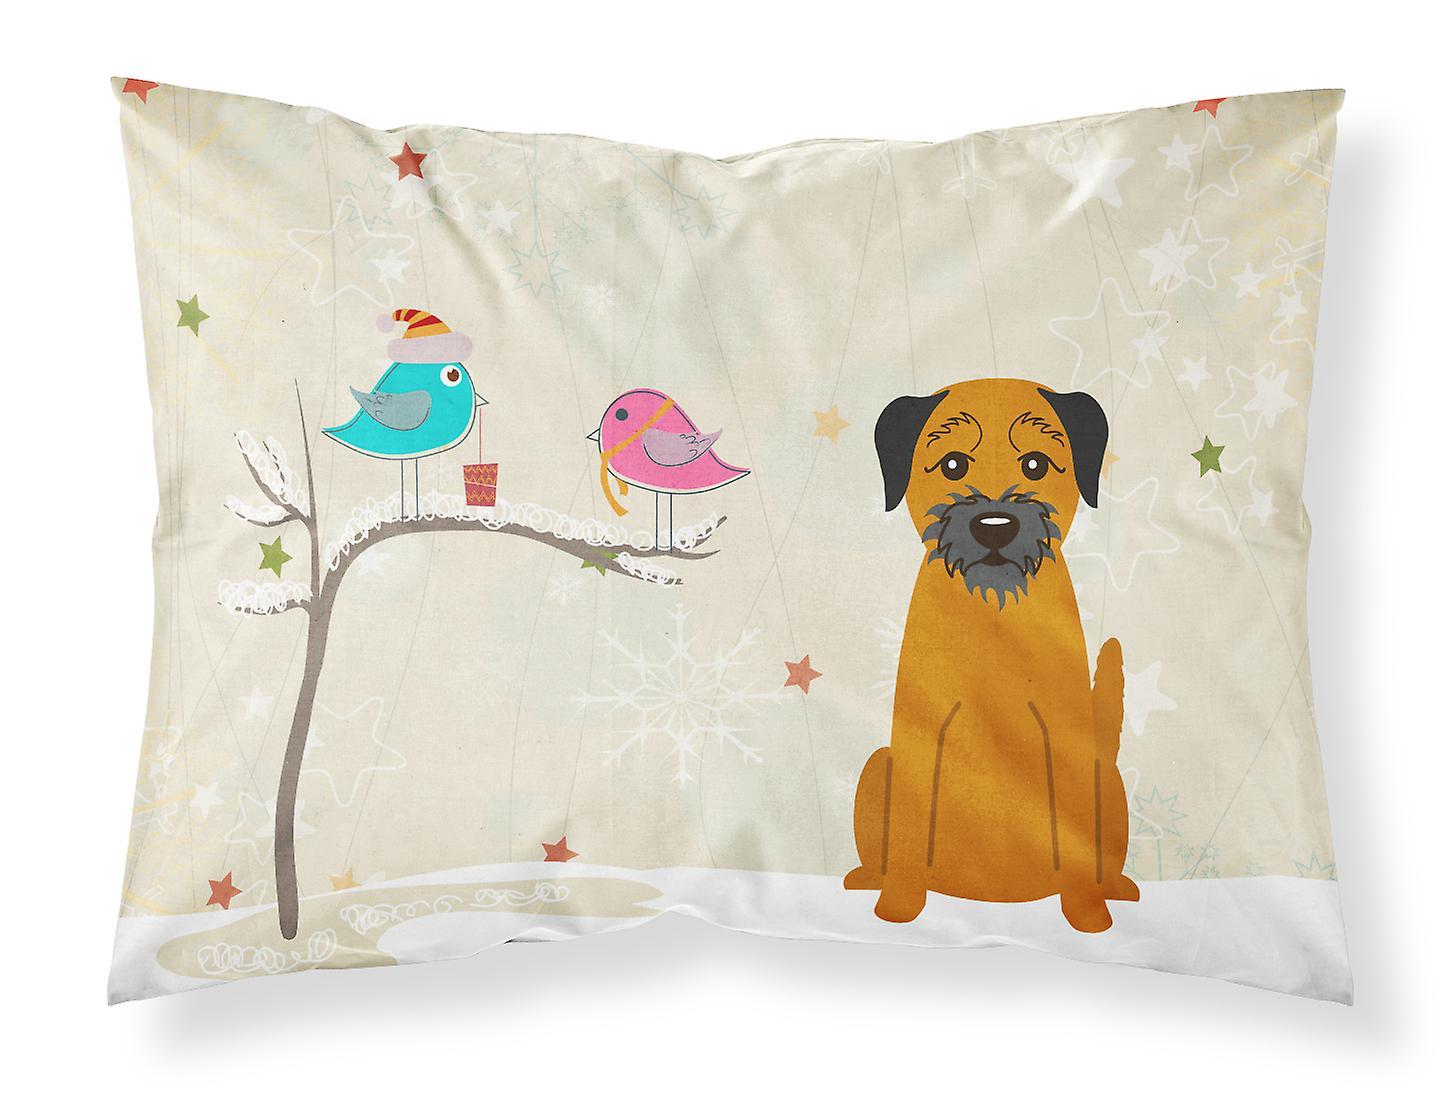 Amis D'oreiller Terrier Cadeaux Standard Border Noël Entre De Tissu Taie RAjL3q54